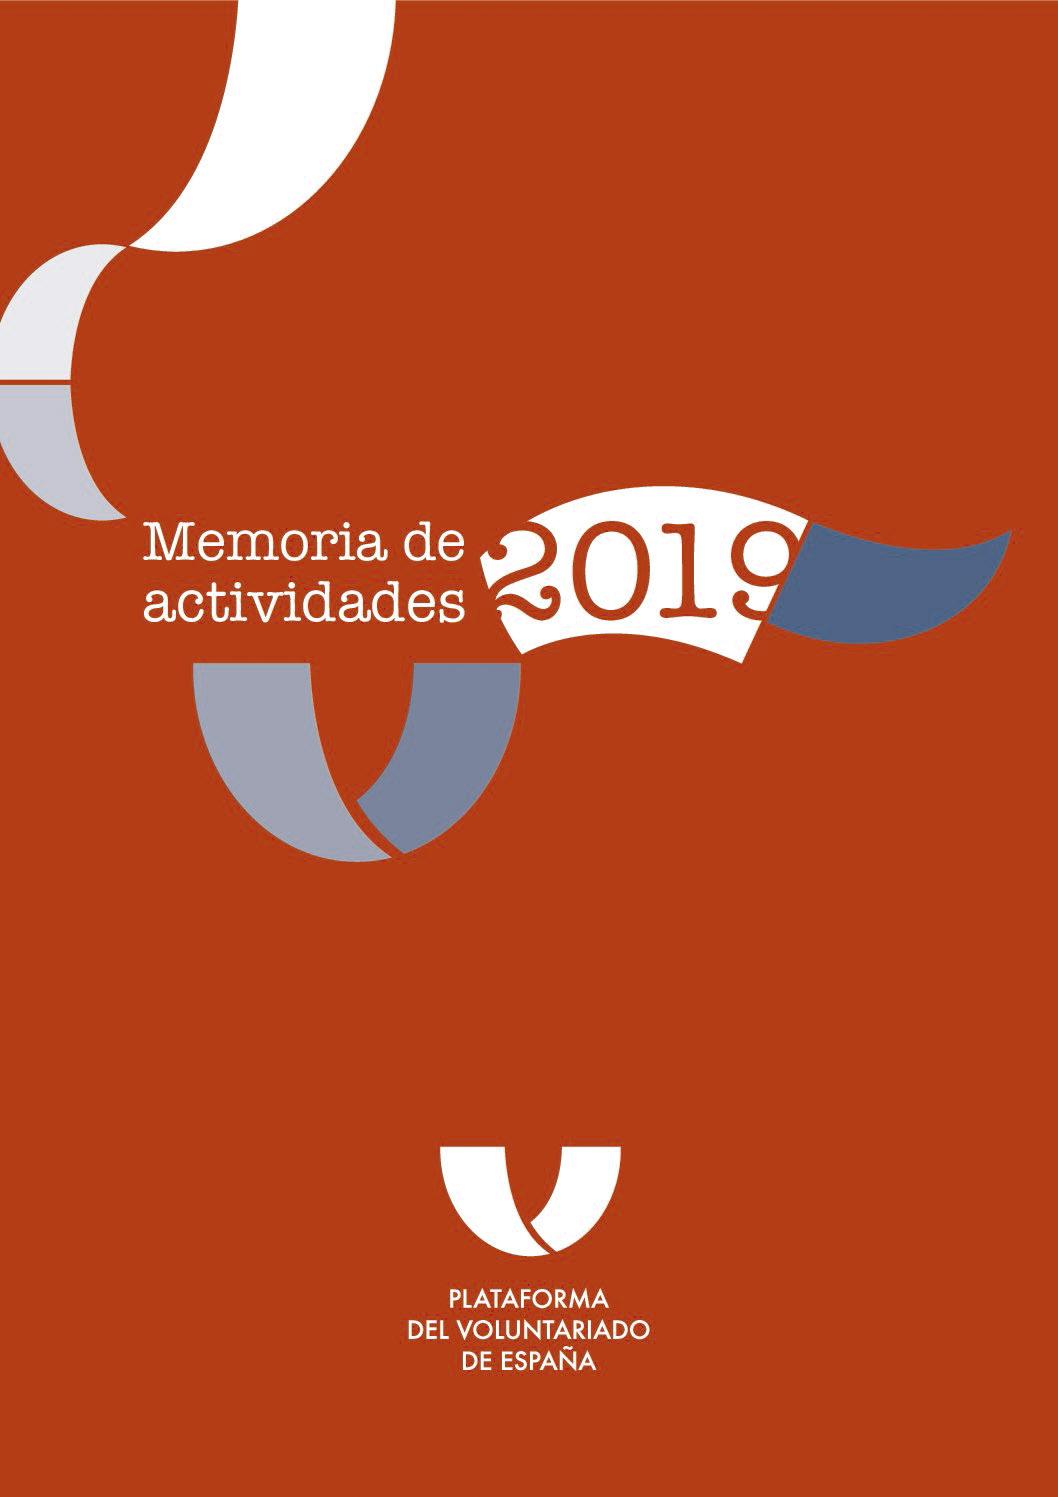 memoria-actividades-2019-pdf